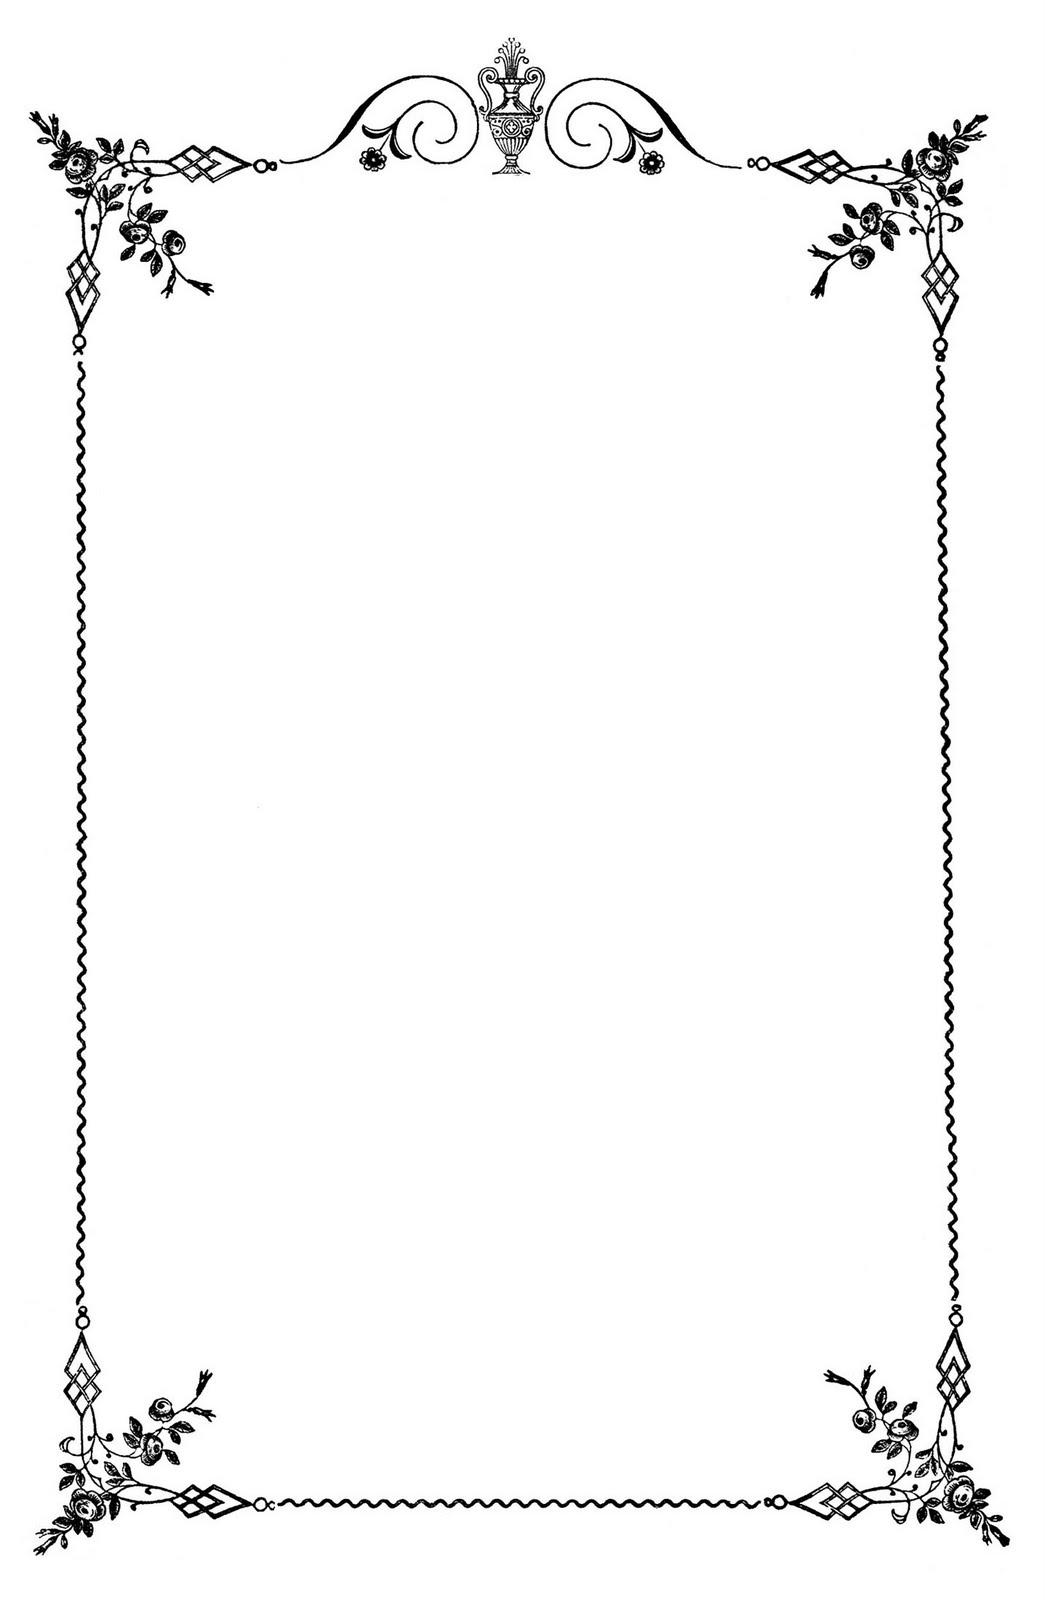 Vintage Clip Art Elegant Frame Wedding M-Vintage Clip Art Elegant Frame Wedding Menus The Graphics Fairy-19